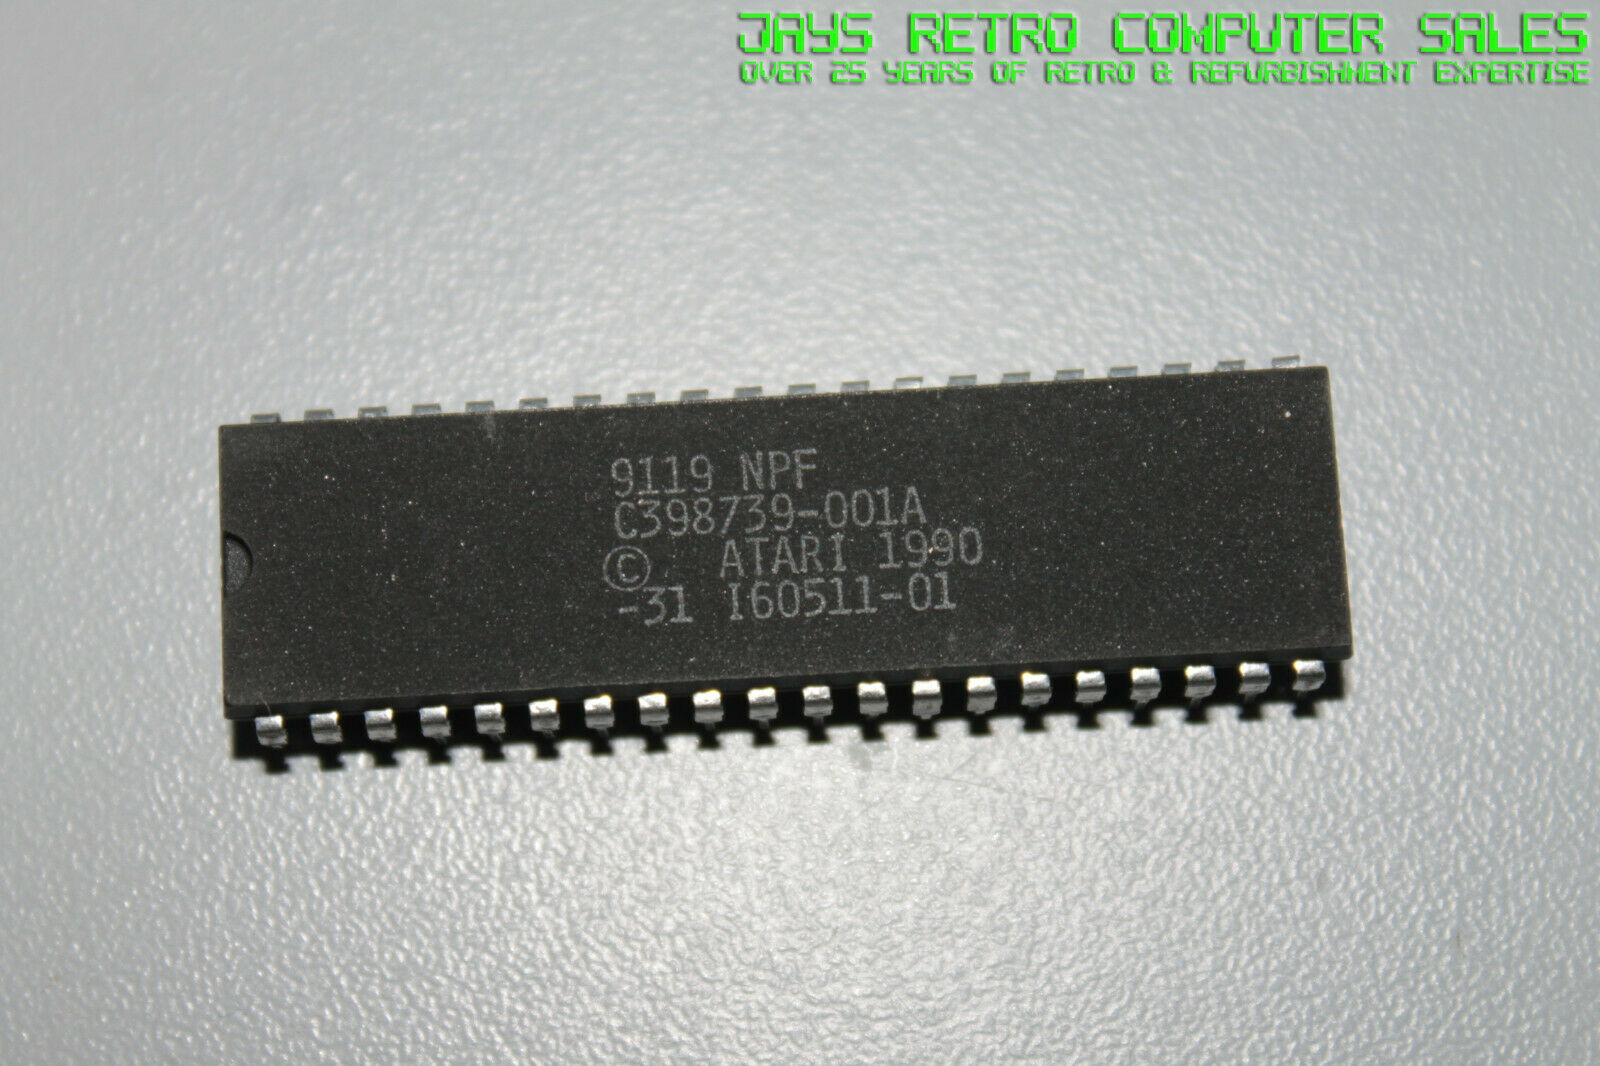 5d80cc4d-5c7b-4a66-83a6-cdcb620a9ac1.jpg